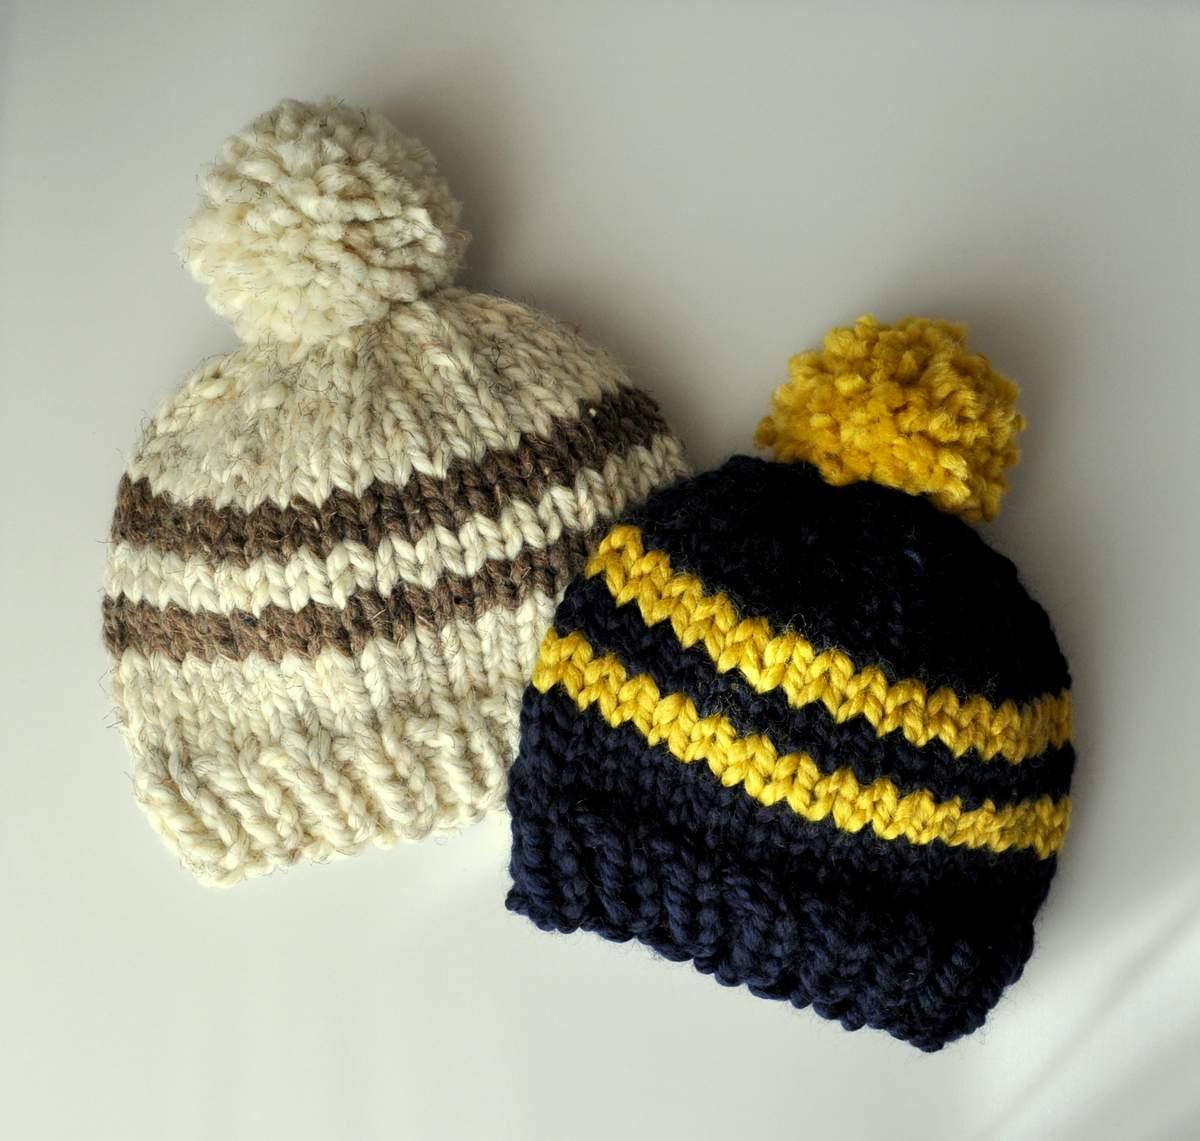 Pom Pom Knit Hat Pattern : Shake your pom pom, shake your pom pom? Classy Crochet